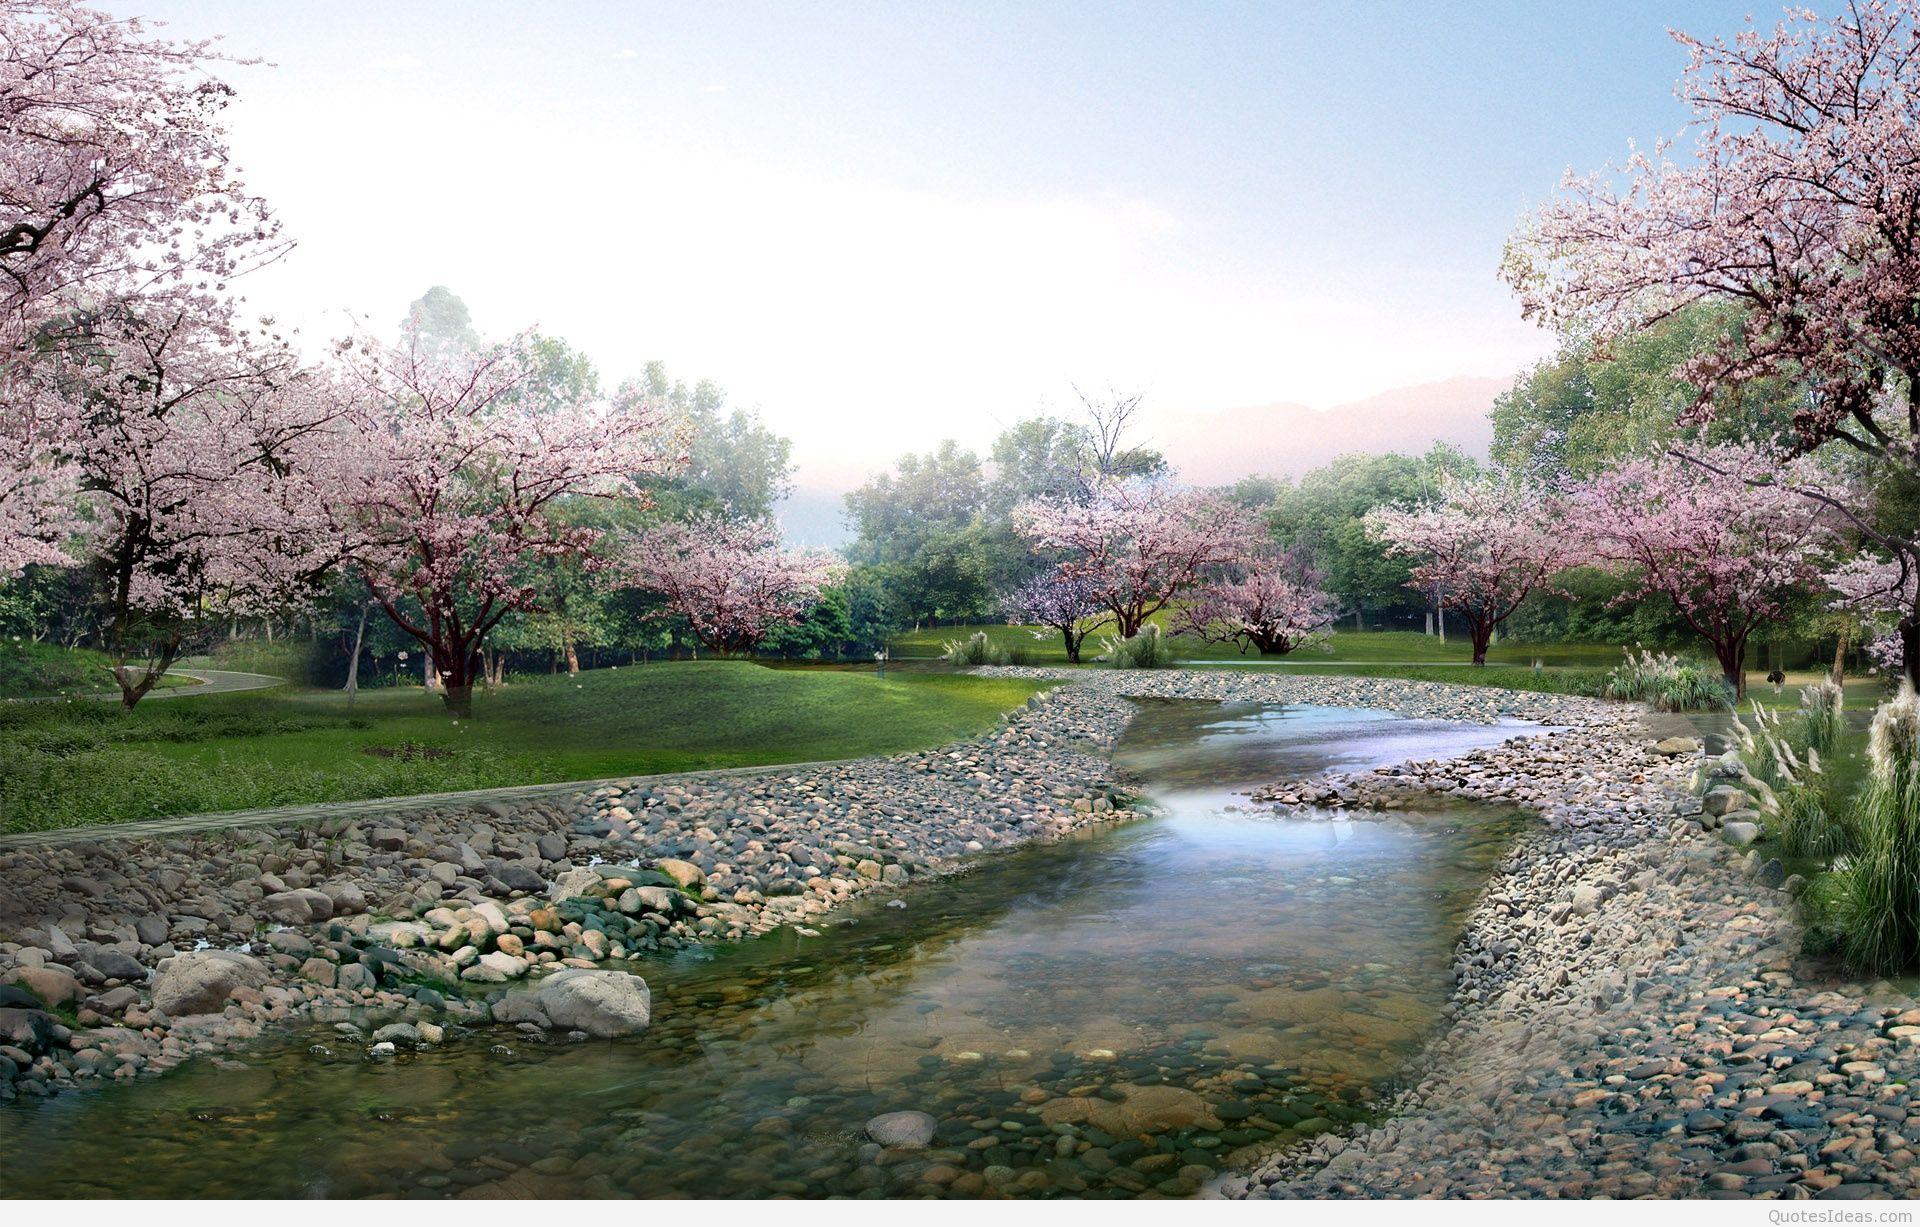 Spring Wallpapers Sky Hd Wallpaper Desktop Landscape - Full Hd Wallpaper Cave Wallpaper Hd Nature - HD Wallpaper